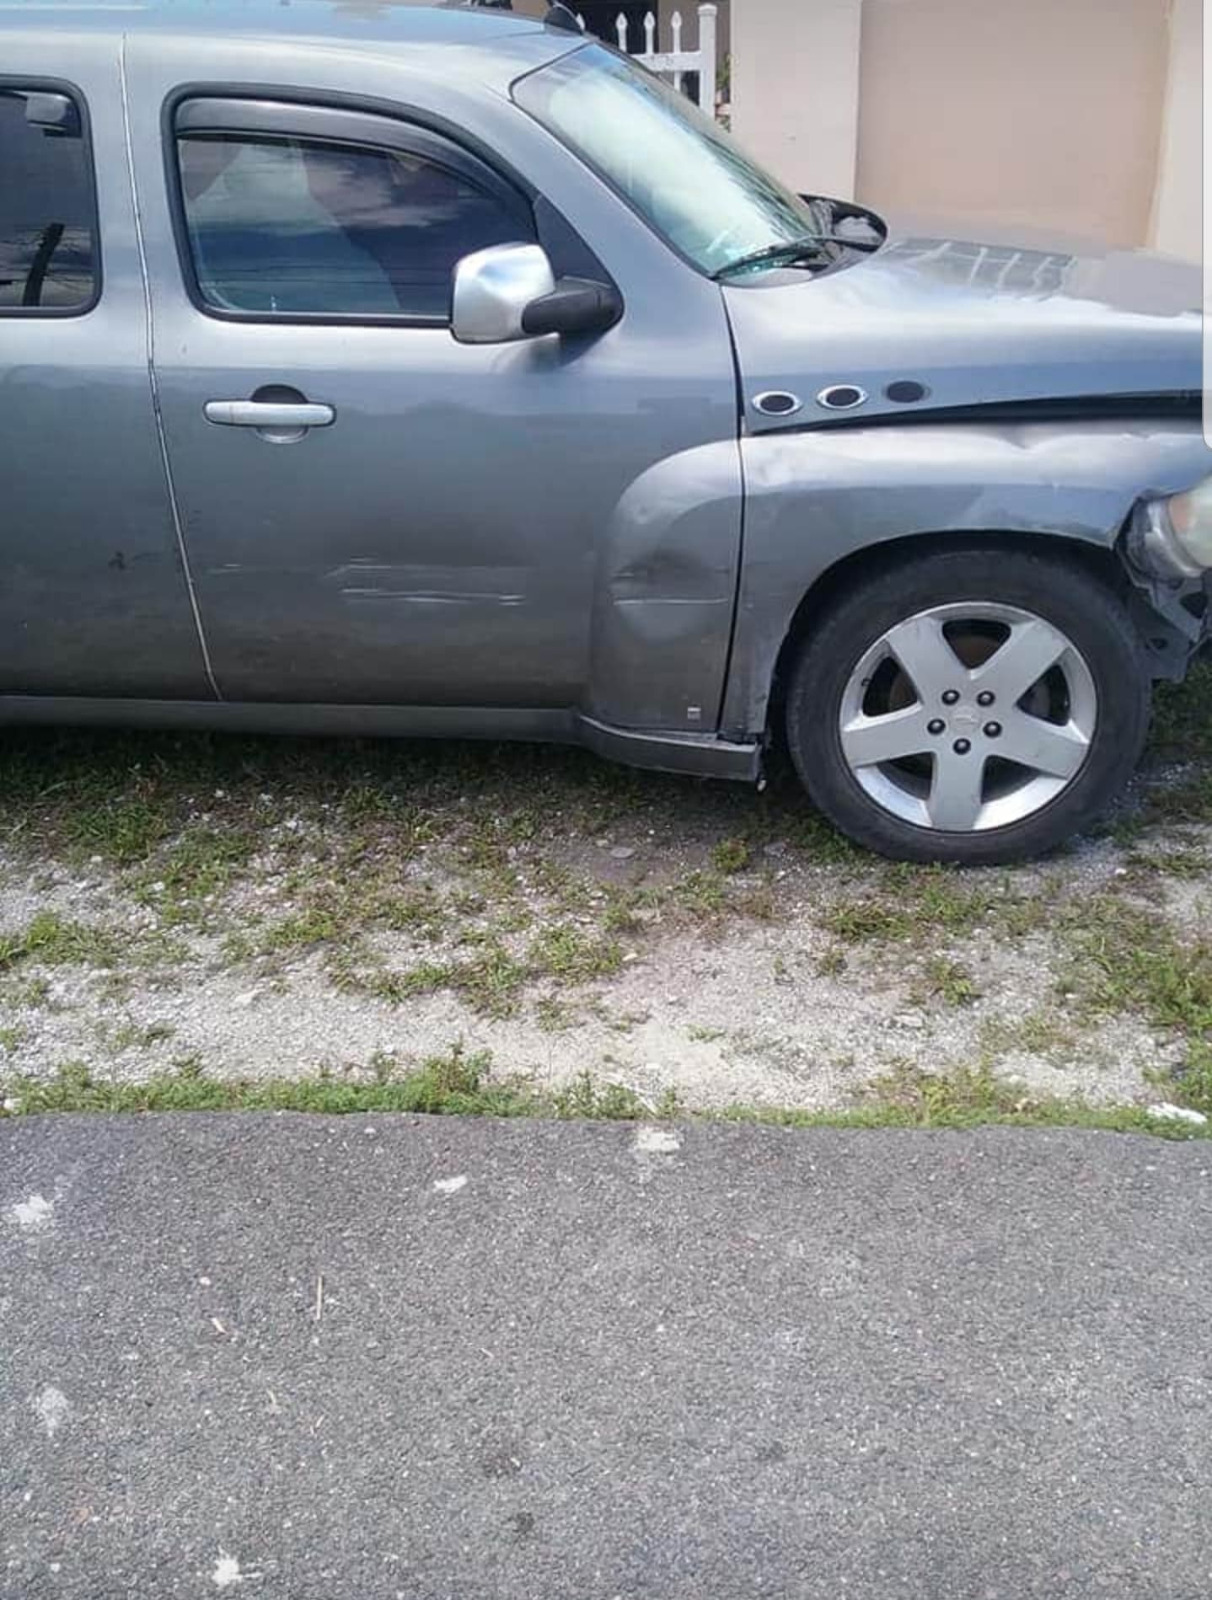 06 Chevy HHR